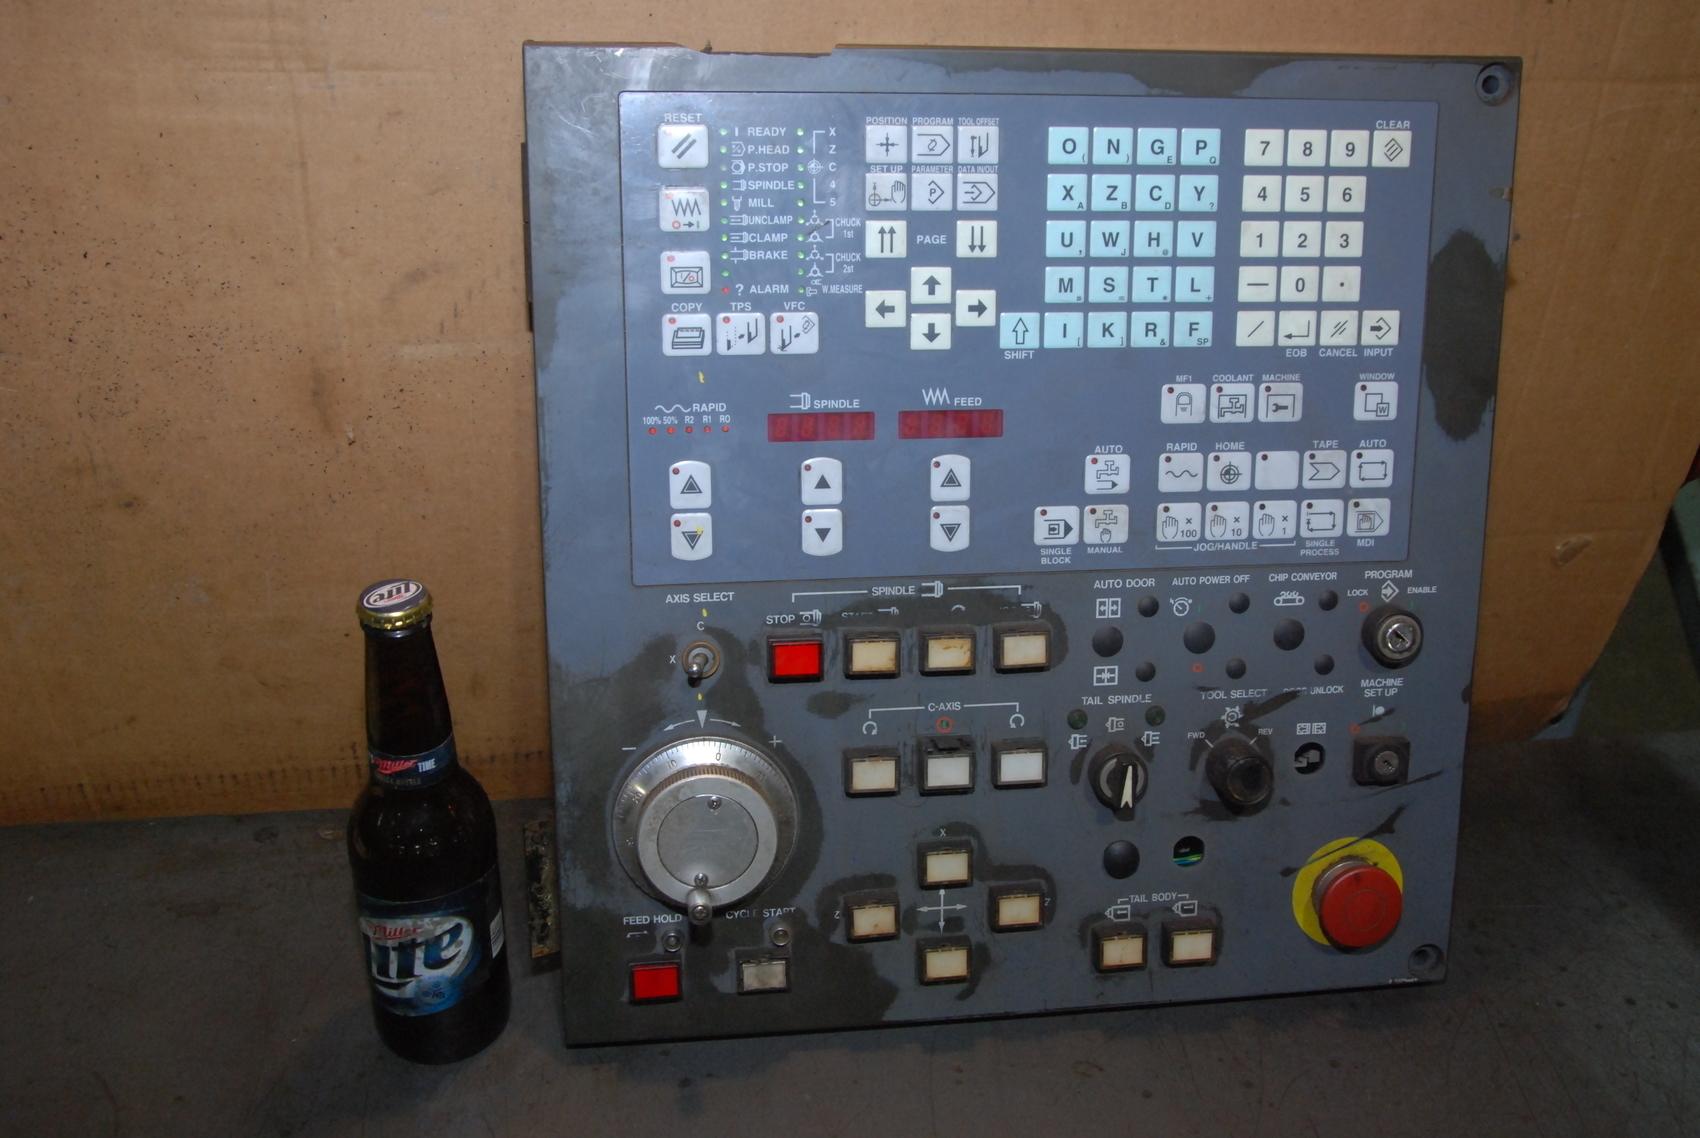 Mitsubishi Mazak qy901 board keyboard